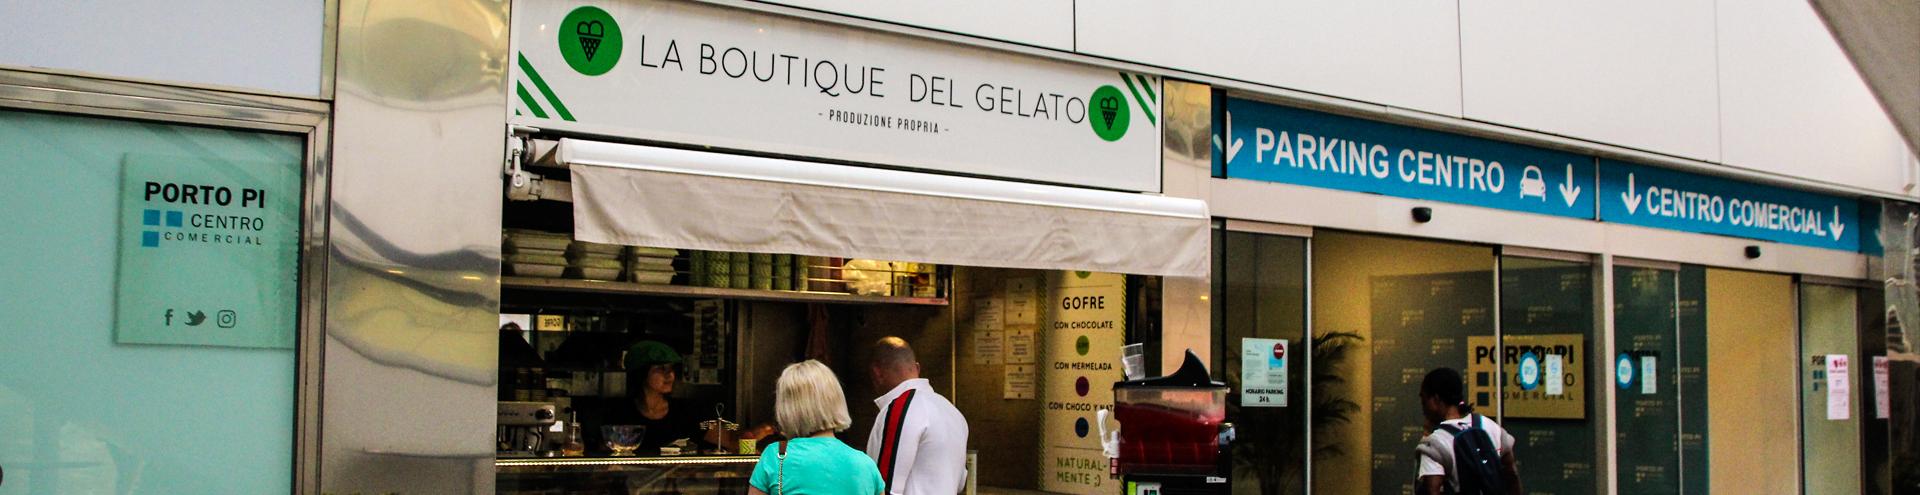 La Boutique del Gelato Porto Pí